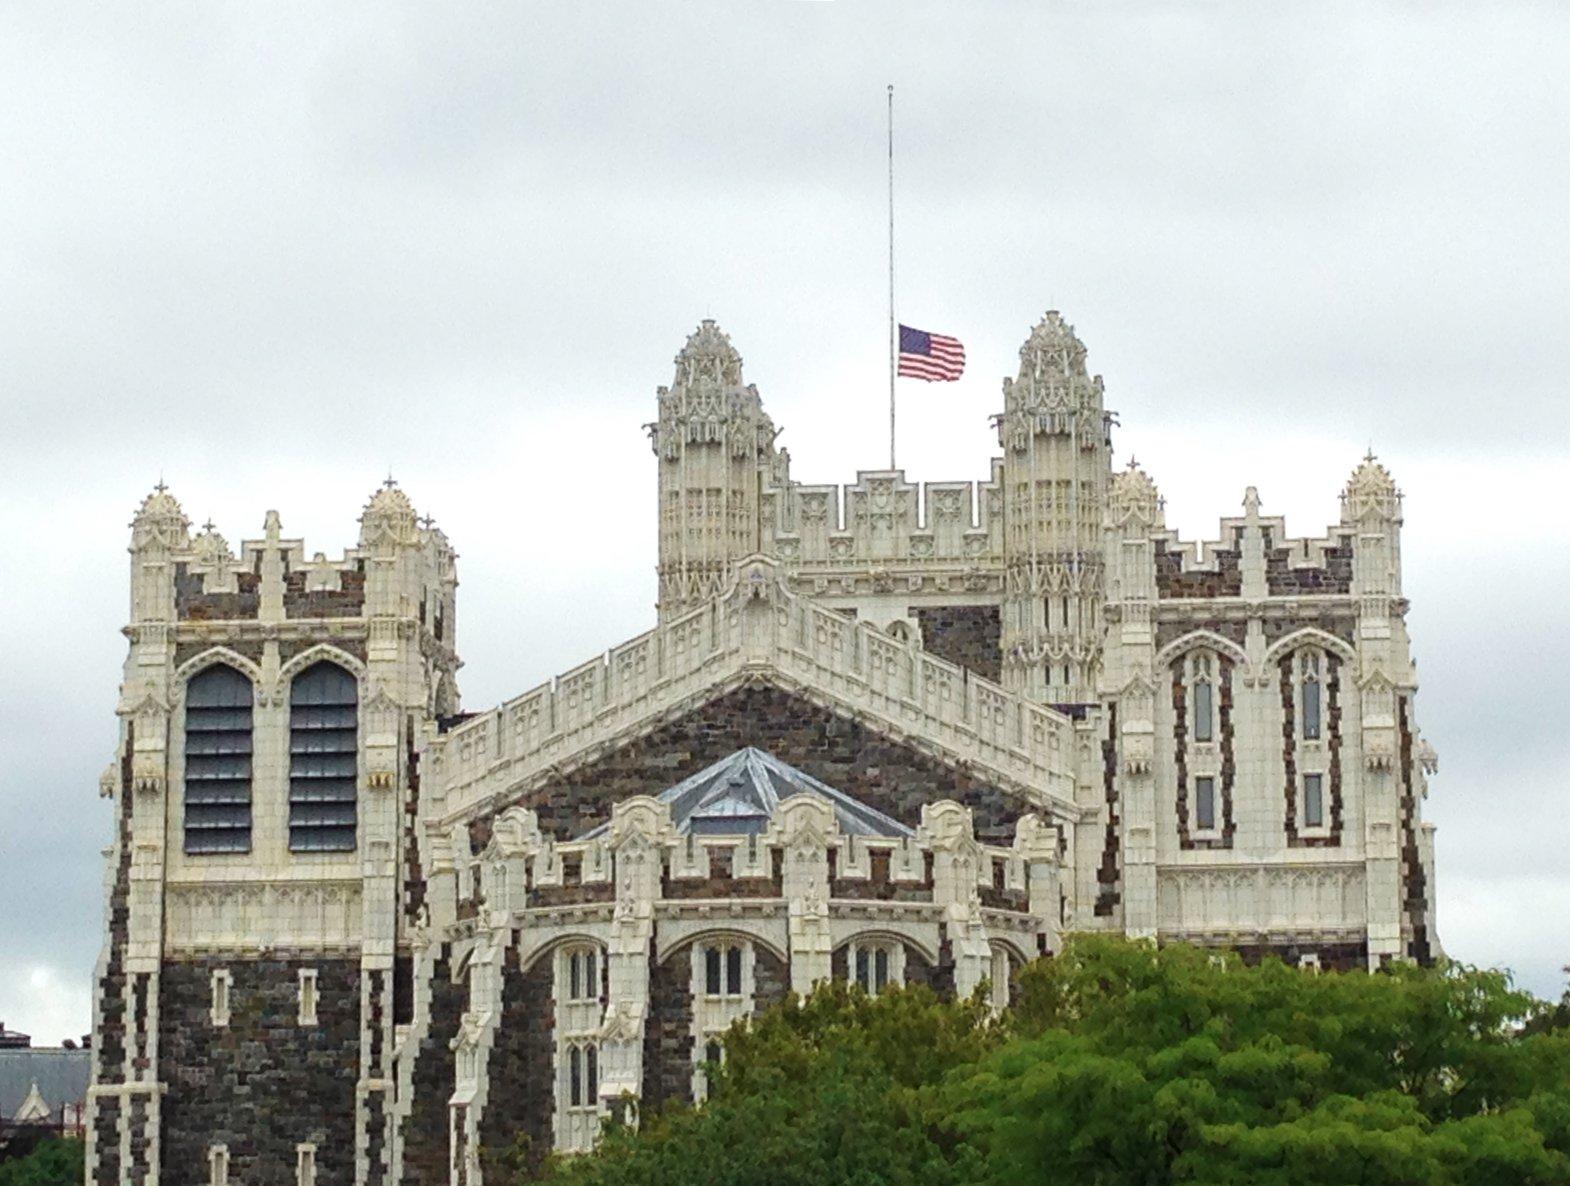 American flag at half mast above CCNY Shepard Hall